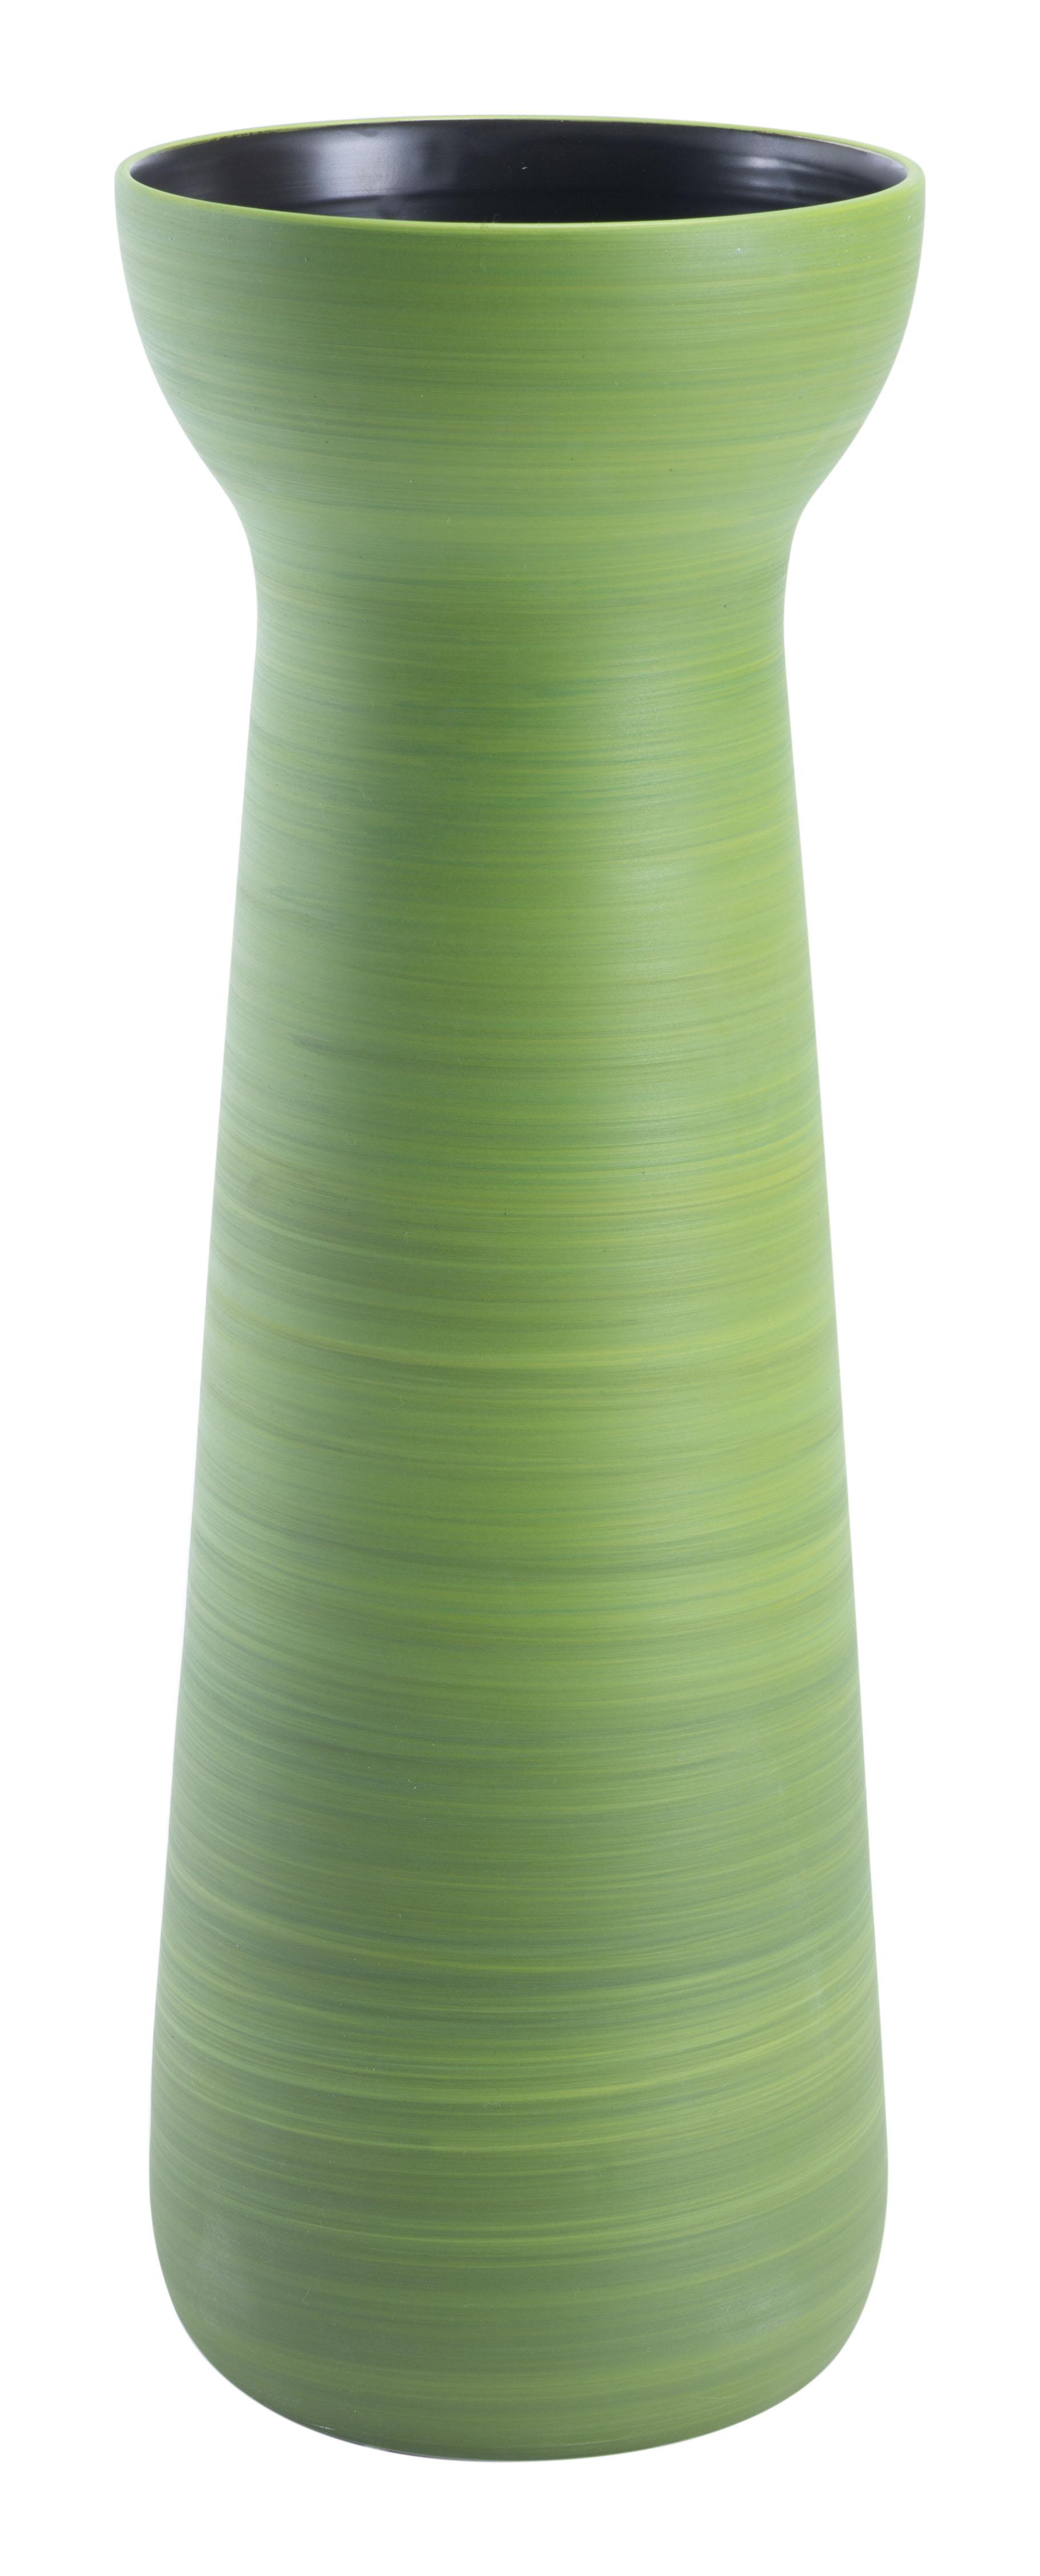 Zuo Modern Areca tall vase